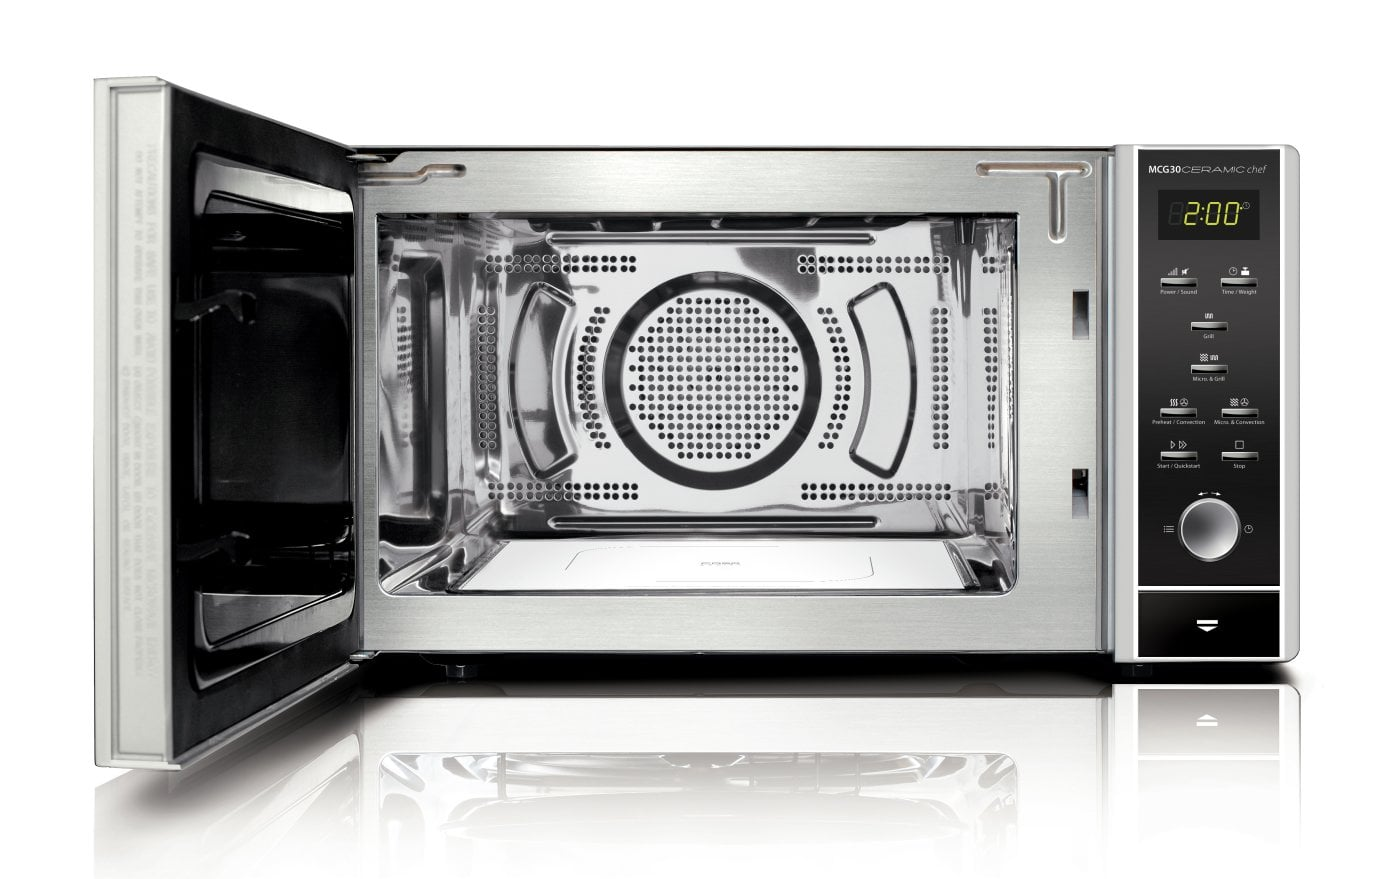 CASO MCG30 Ceramic Chef Design Mikrowelle U0026 Heißluft U0026 Grill